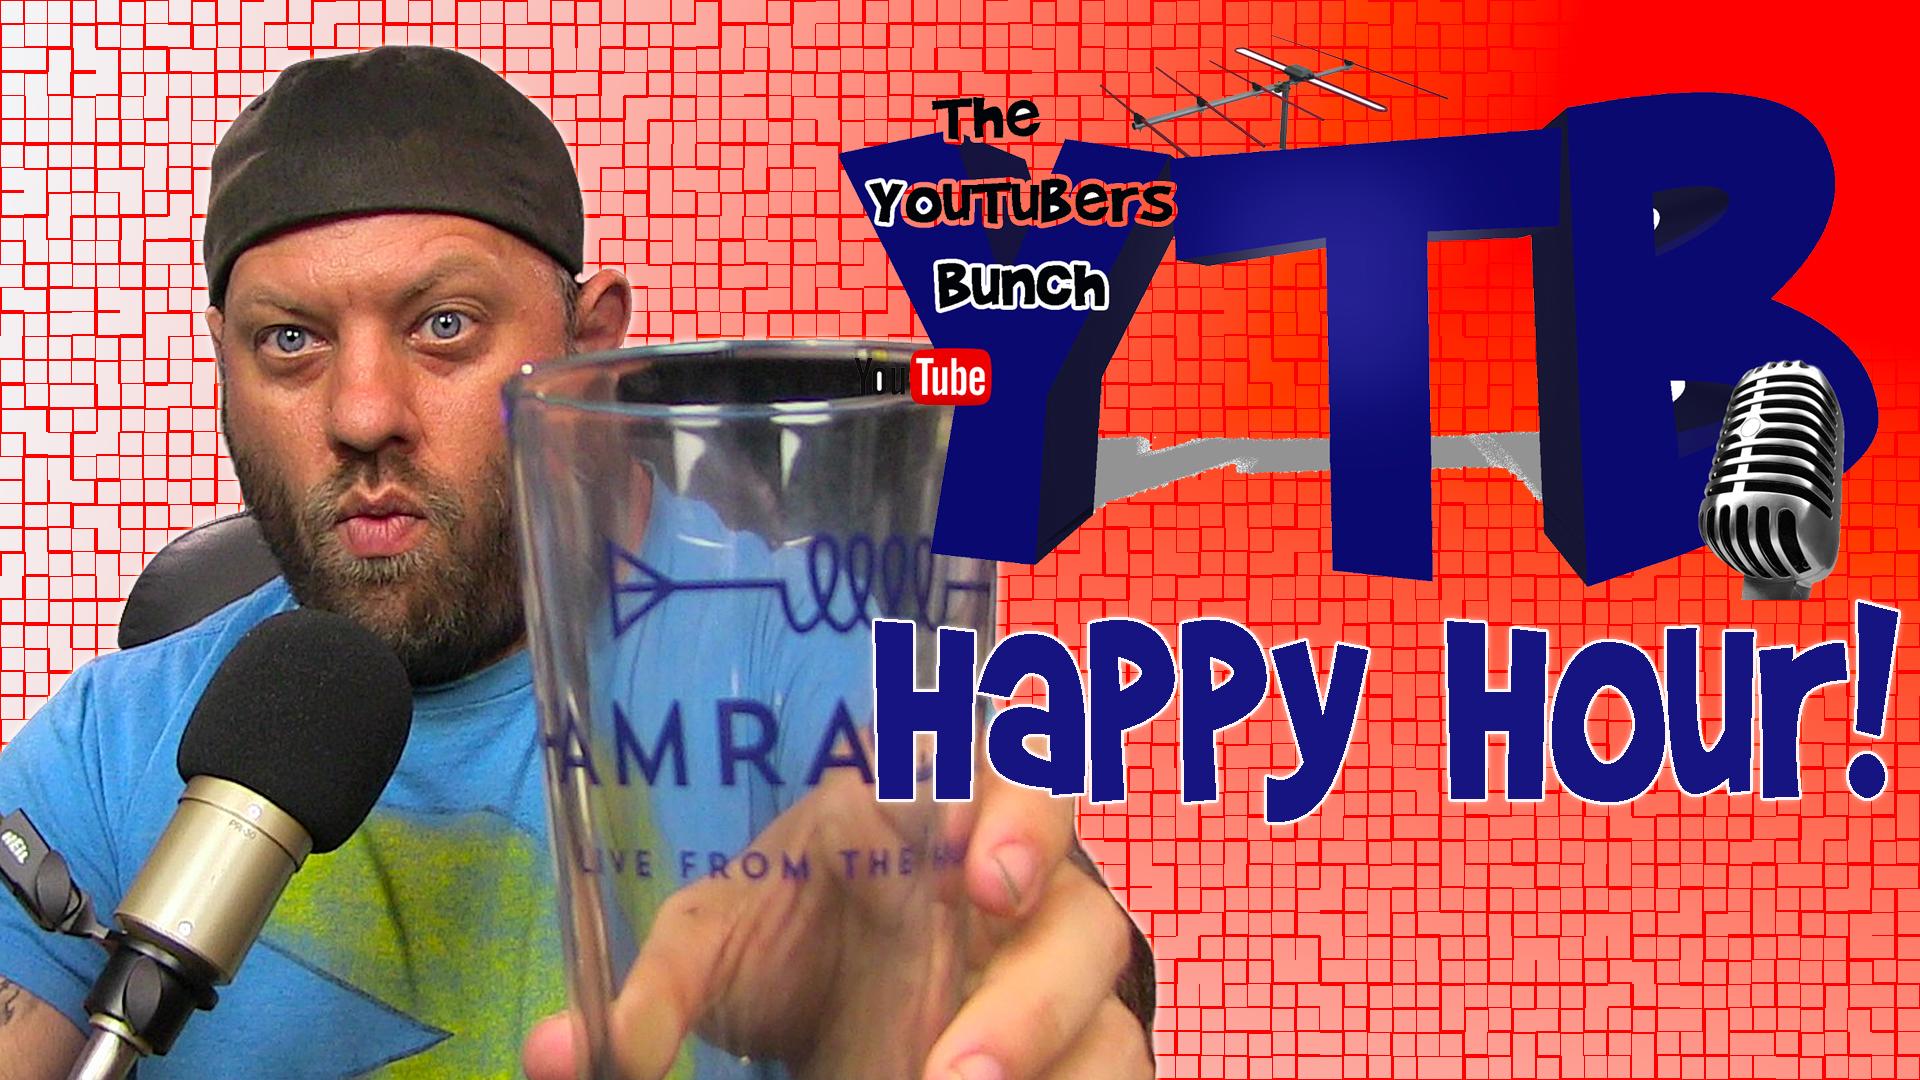 Episode 539: Ham Radio Happy Hour for YouTubers!